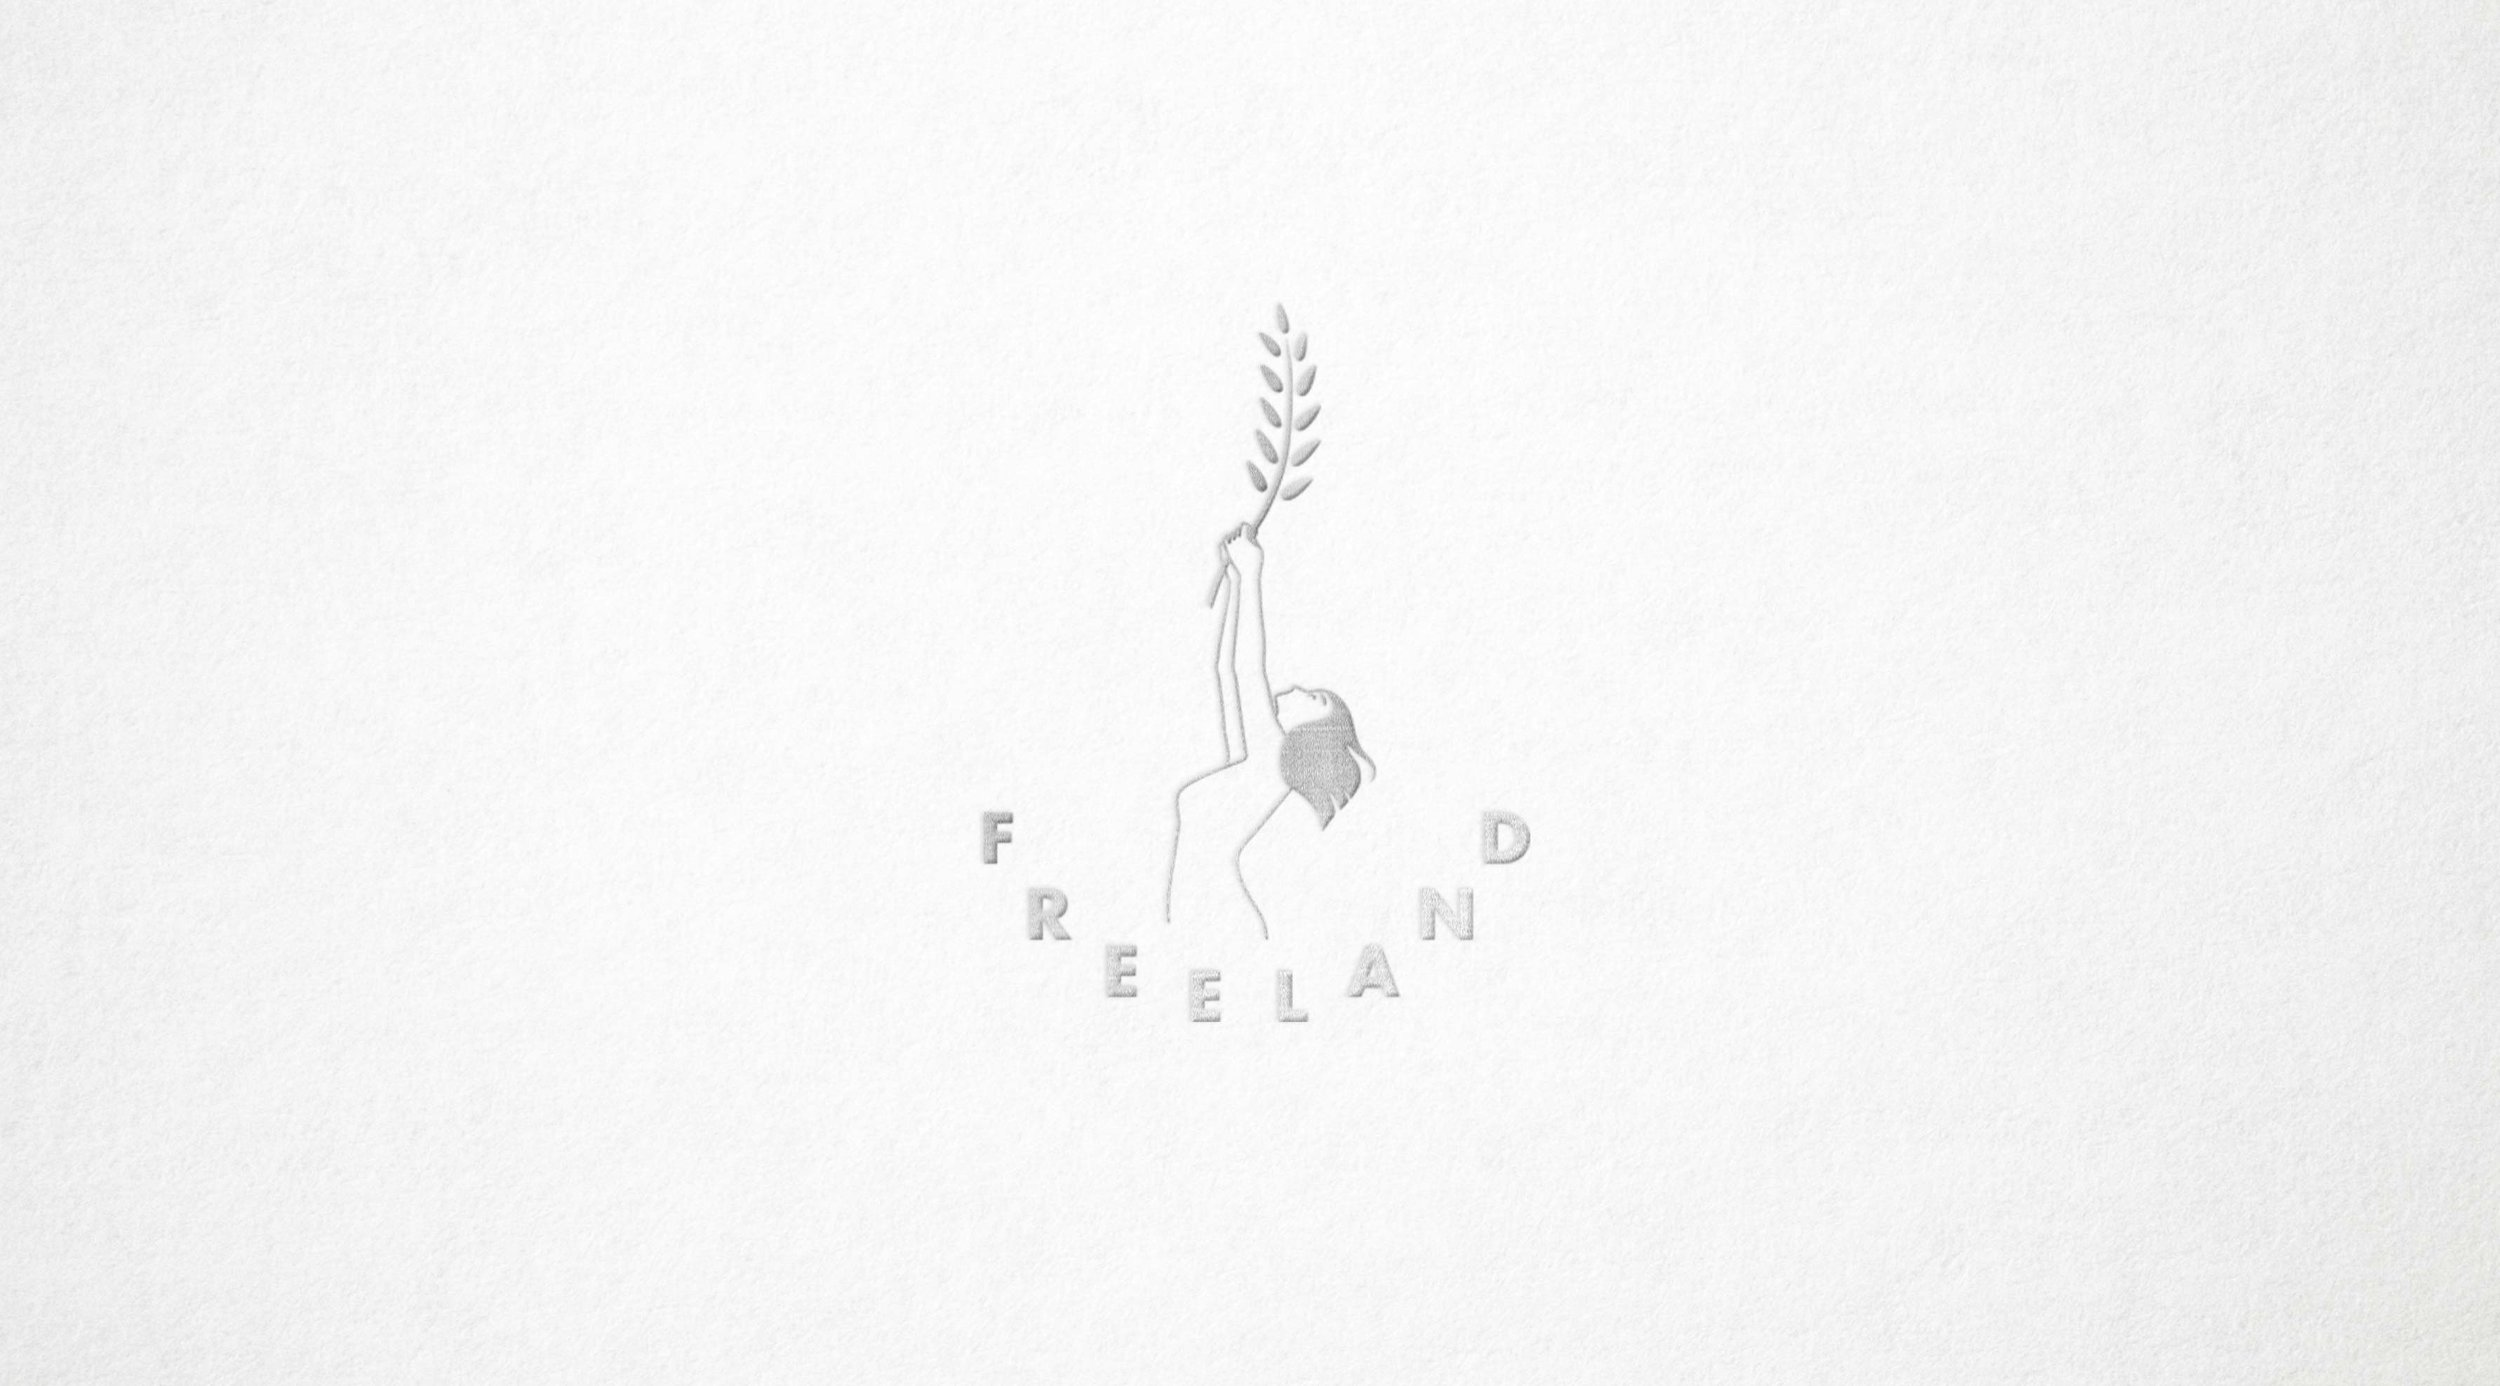 12_5_16_Freeland_Logo_Mockup.jpg